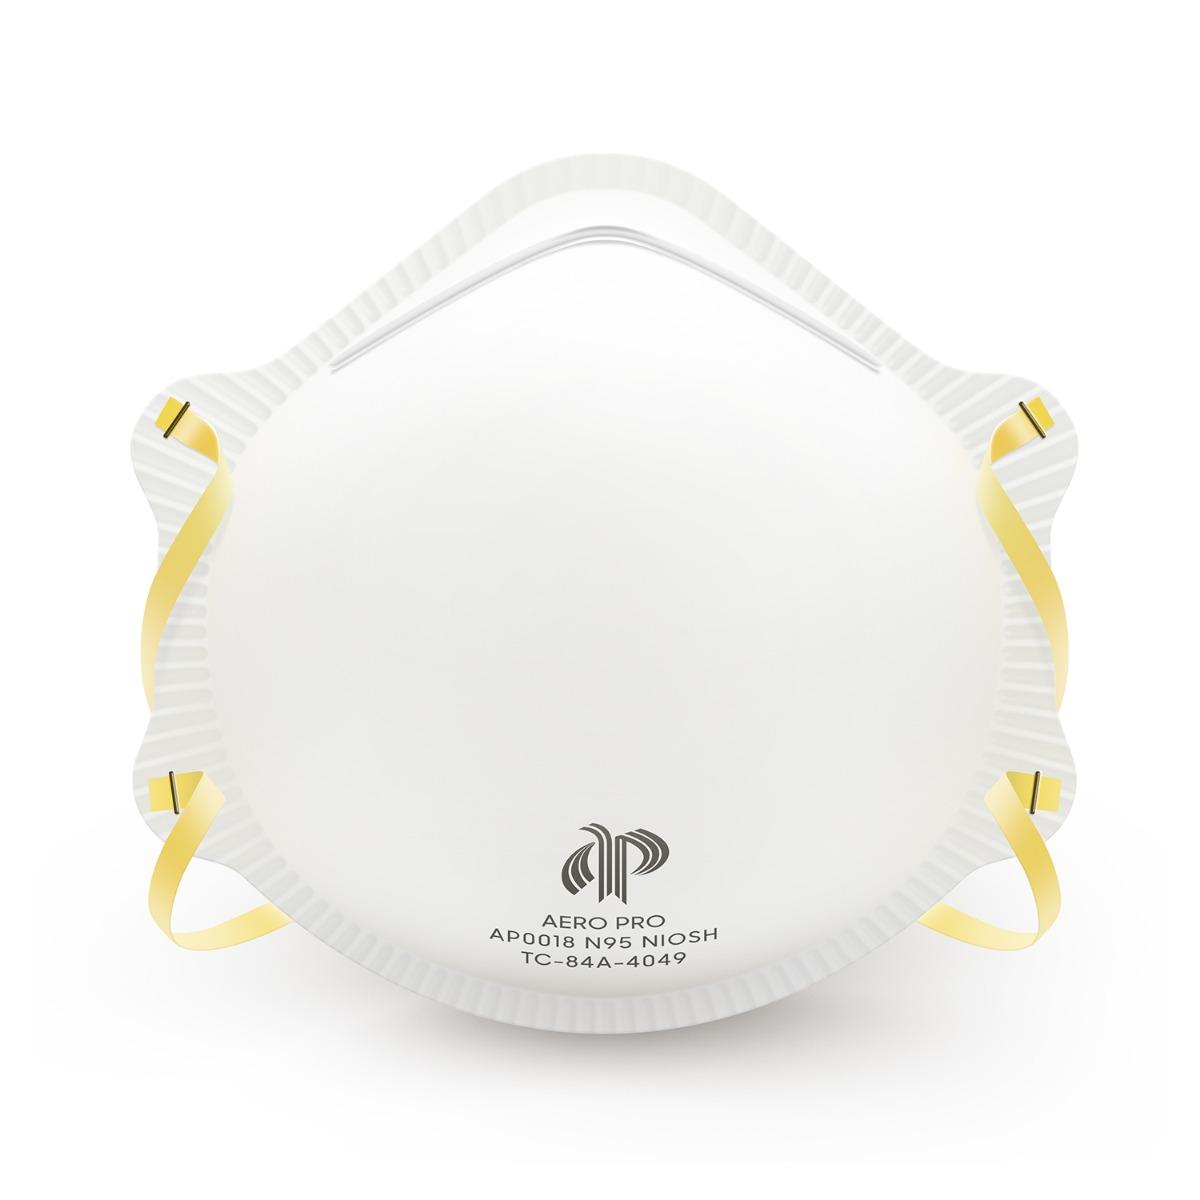 300-Pack N95 Respirator (NIOSH), FDA 510K Cleared Surgical Respirator Mask, Medical Grade Disposable Particulate Filtering Respirator (300 Count)